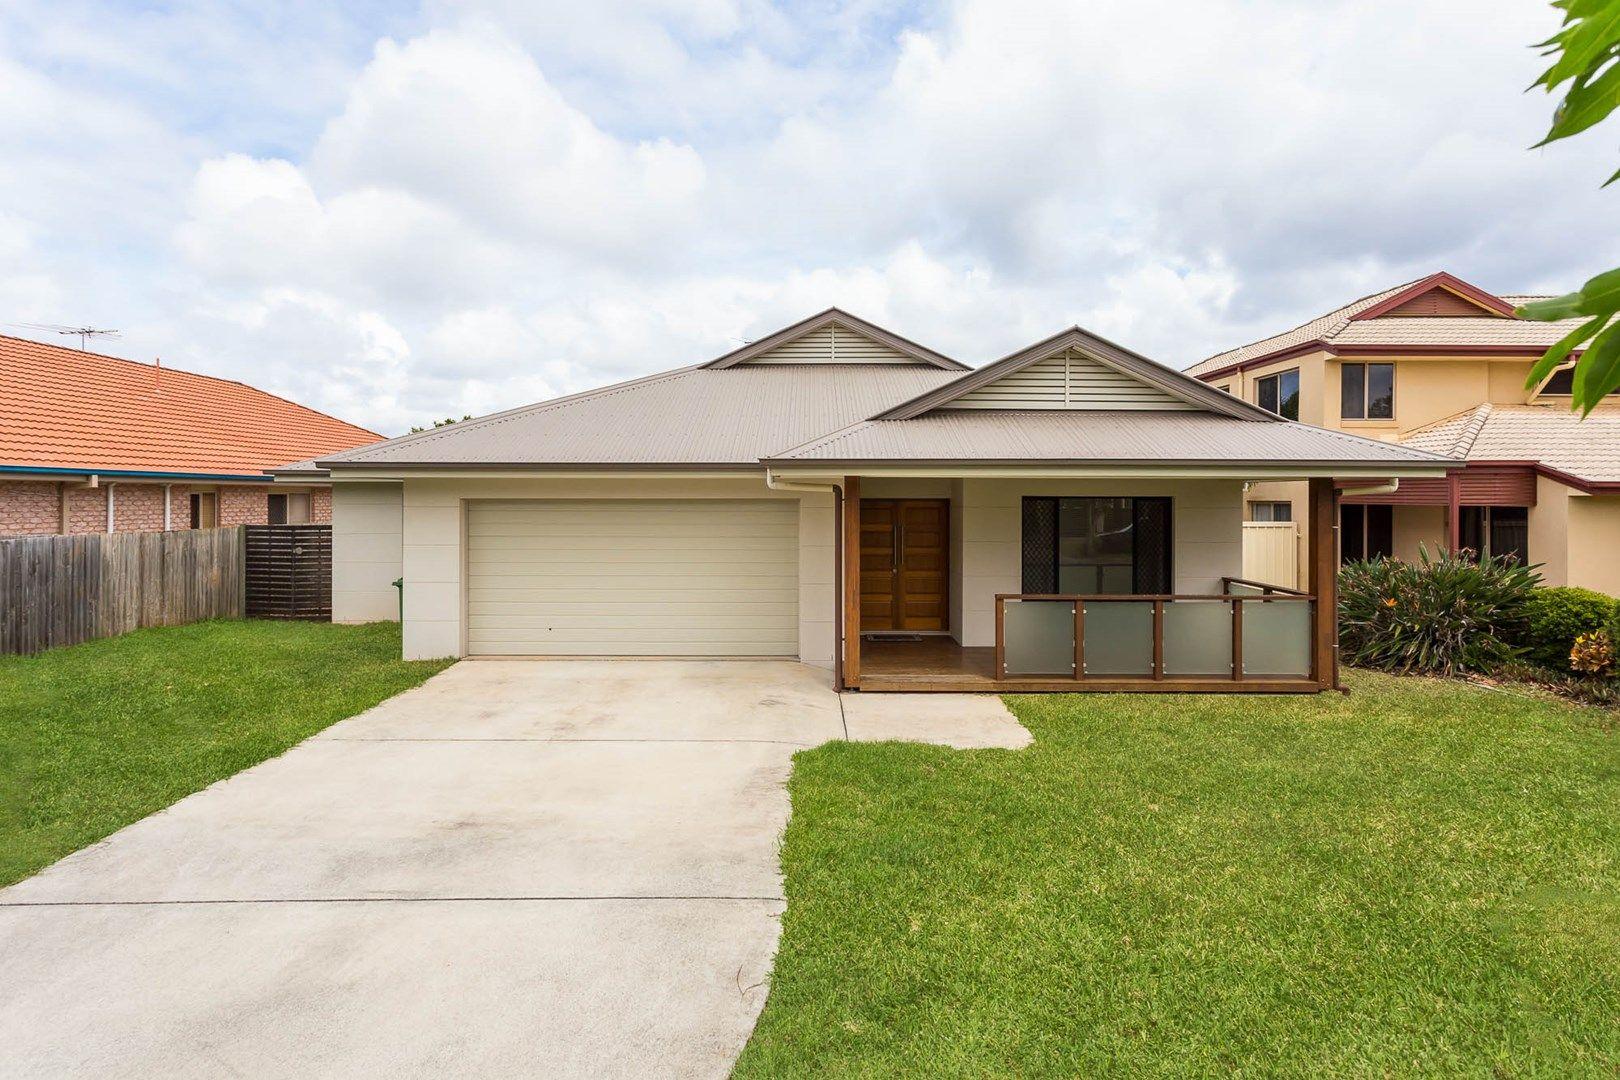 18 Wilohurst Drive, Redland Bay QLD 4165, Image 0